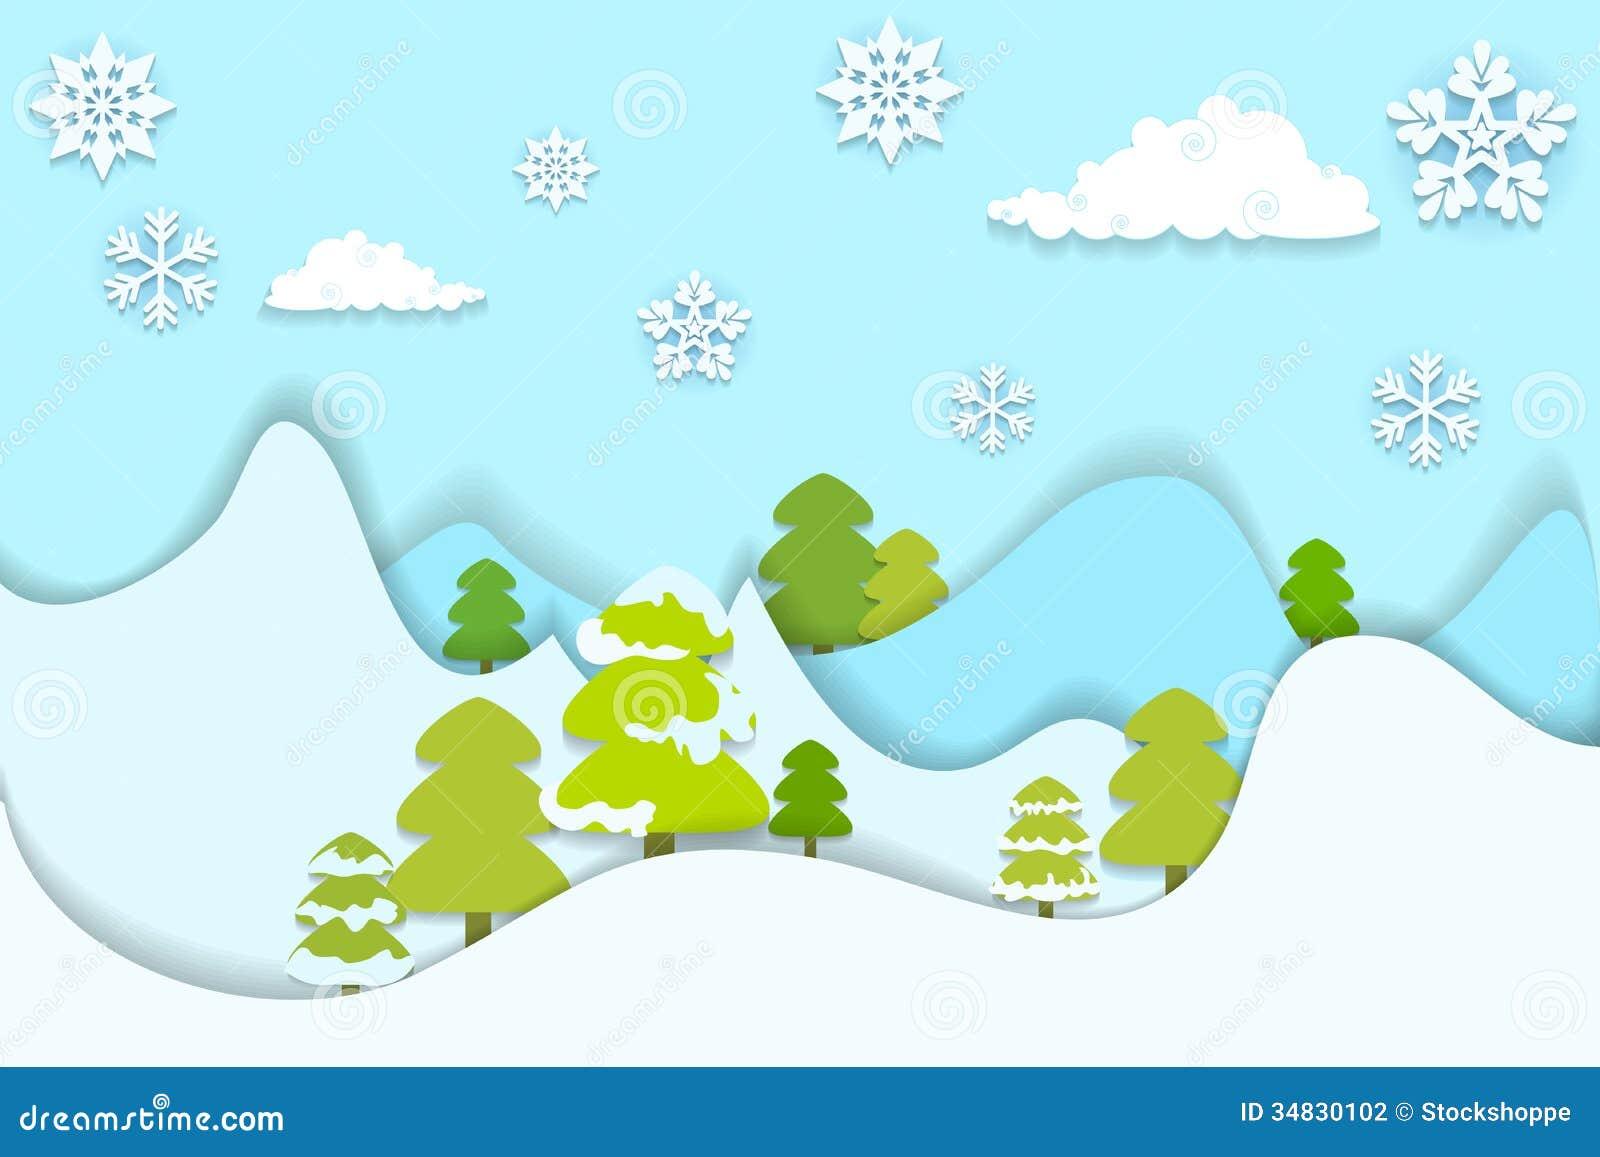 Snowy Pine Tree Vector